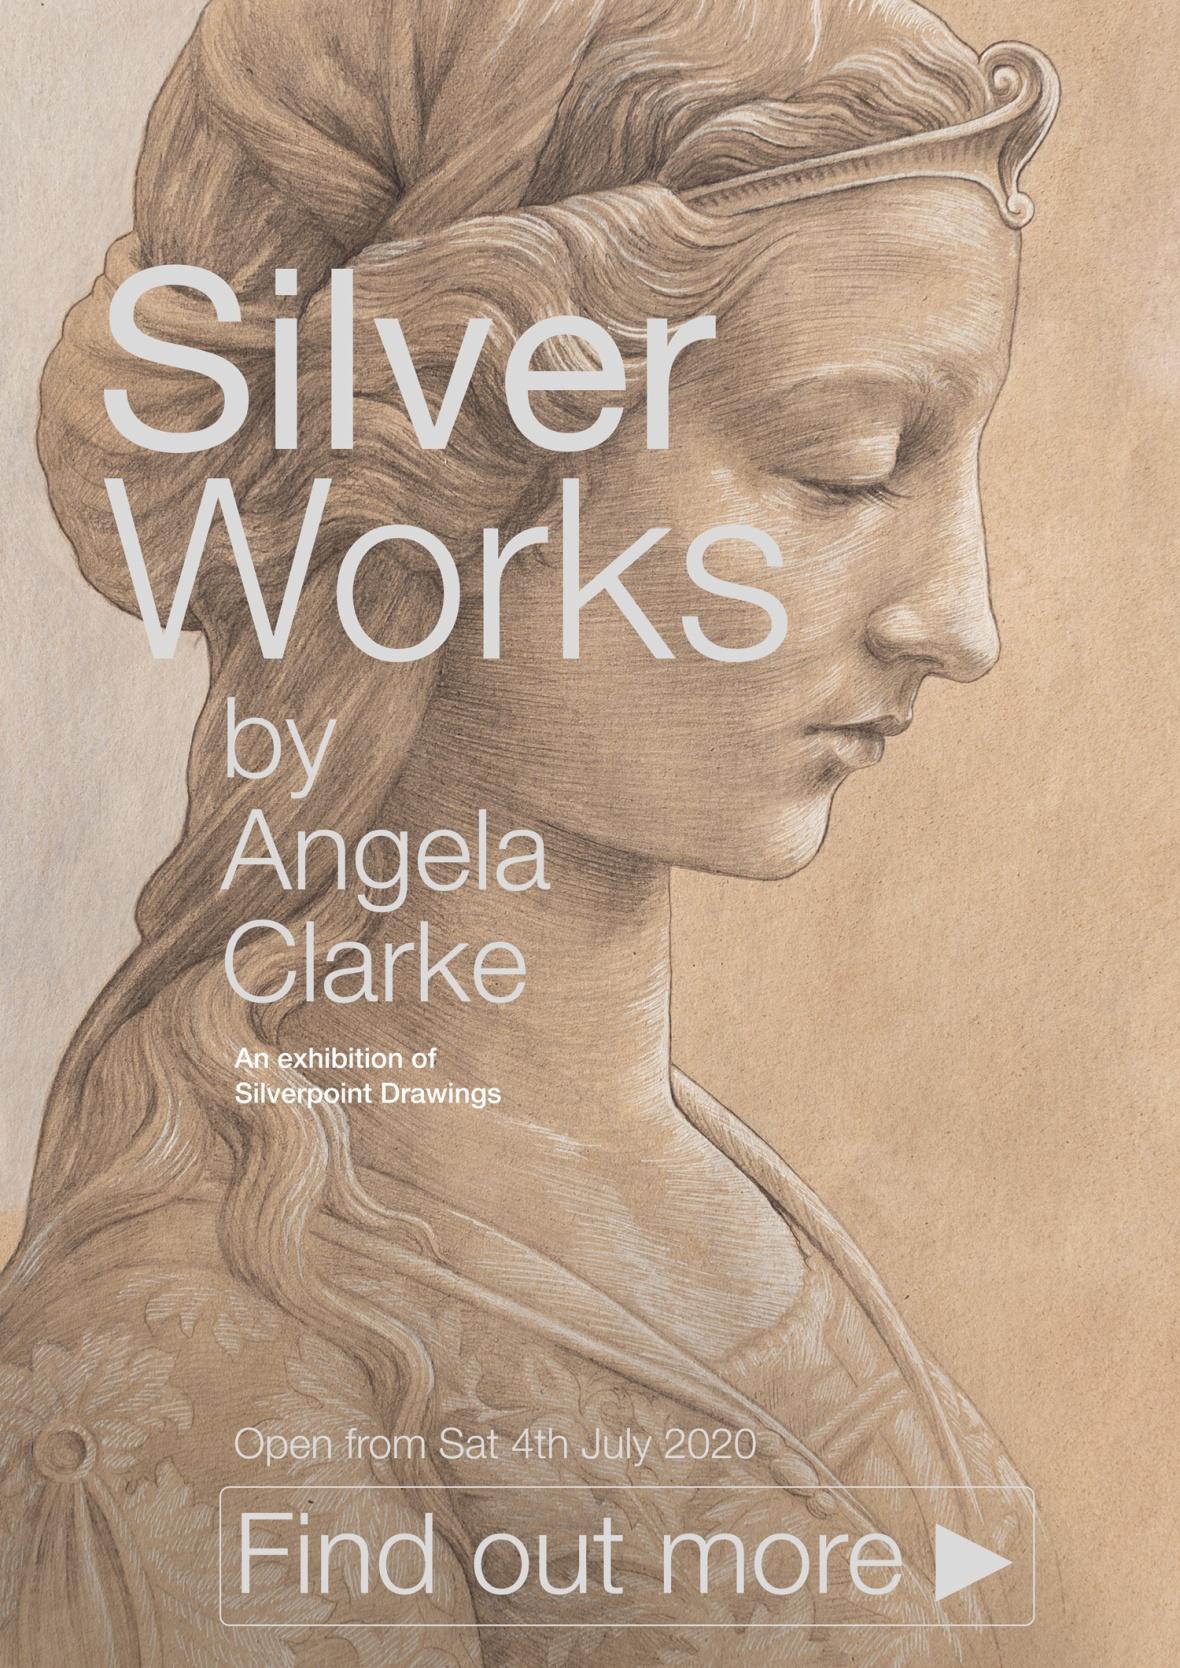 SilverWorks exhibition by Angela Clarke